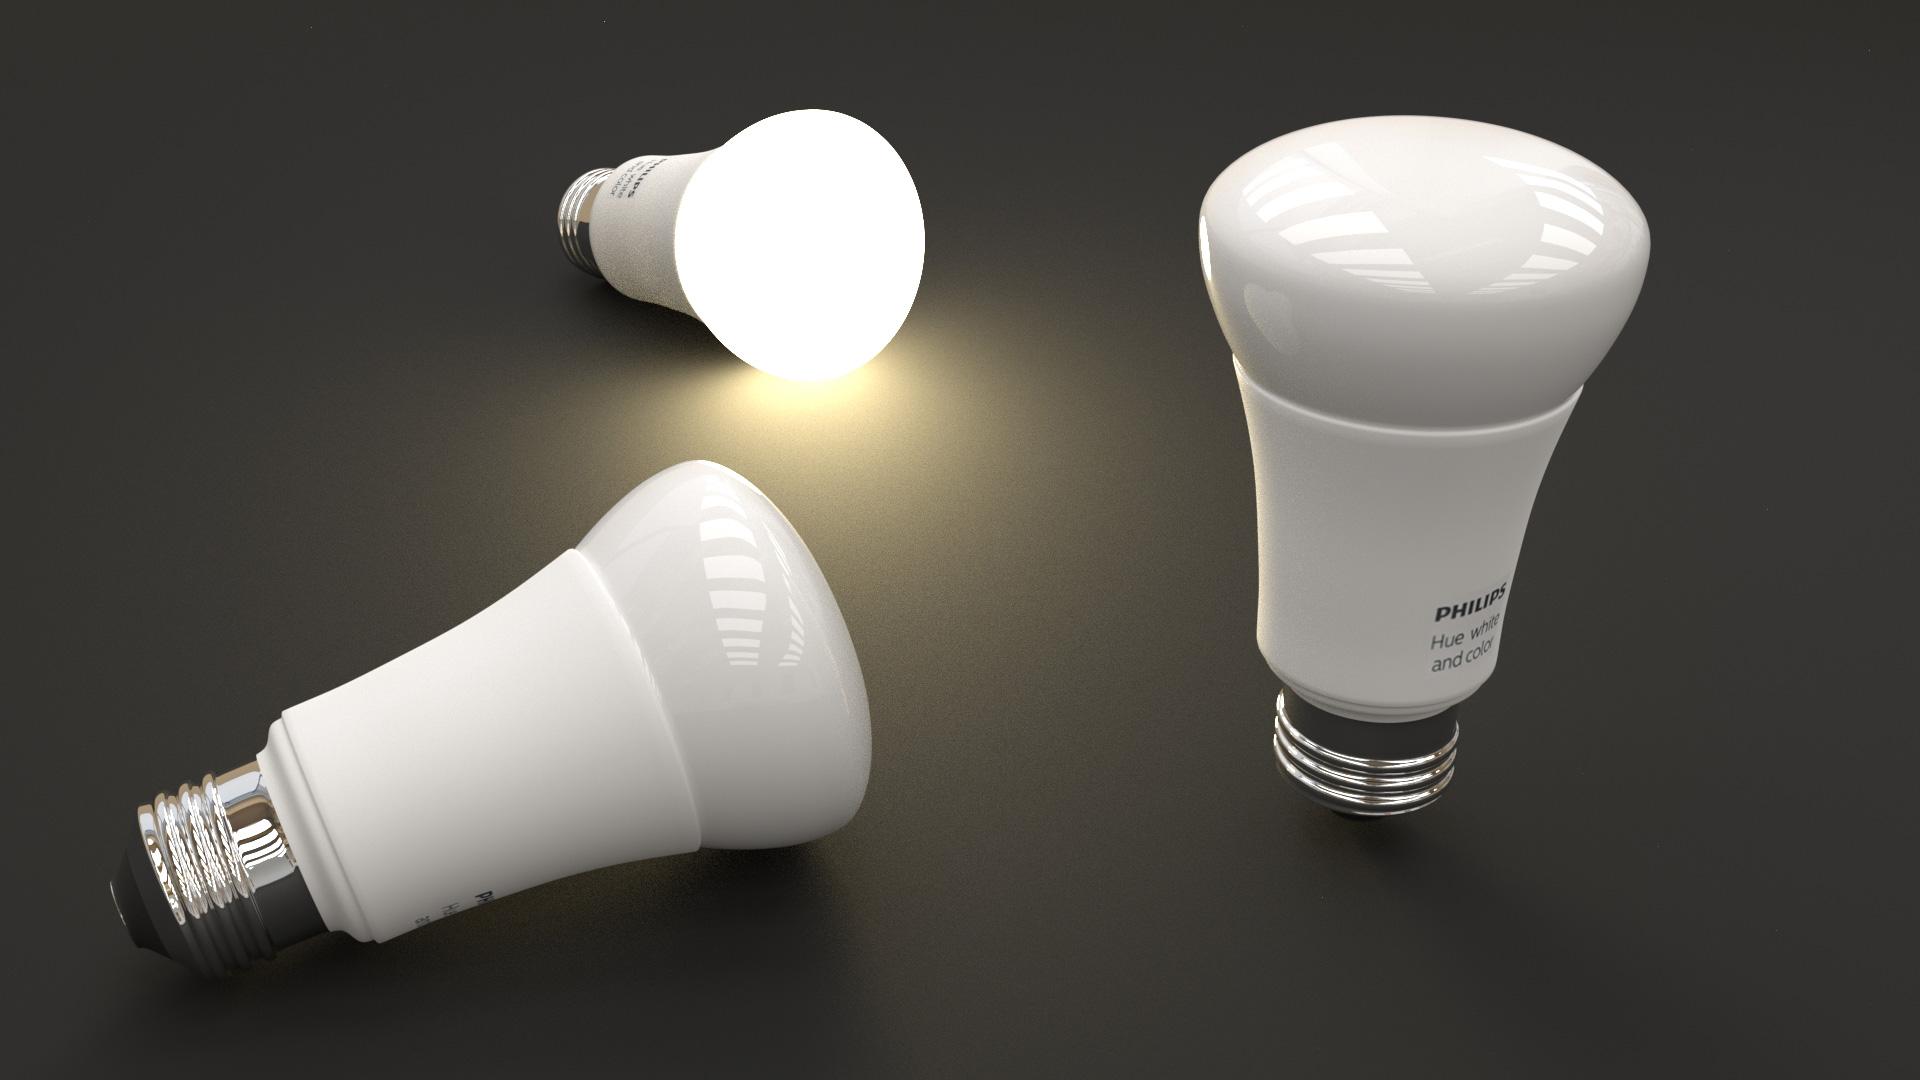 Philips Hue - Bunte Beleuchtung fürs Smart Home